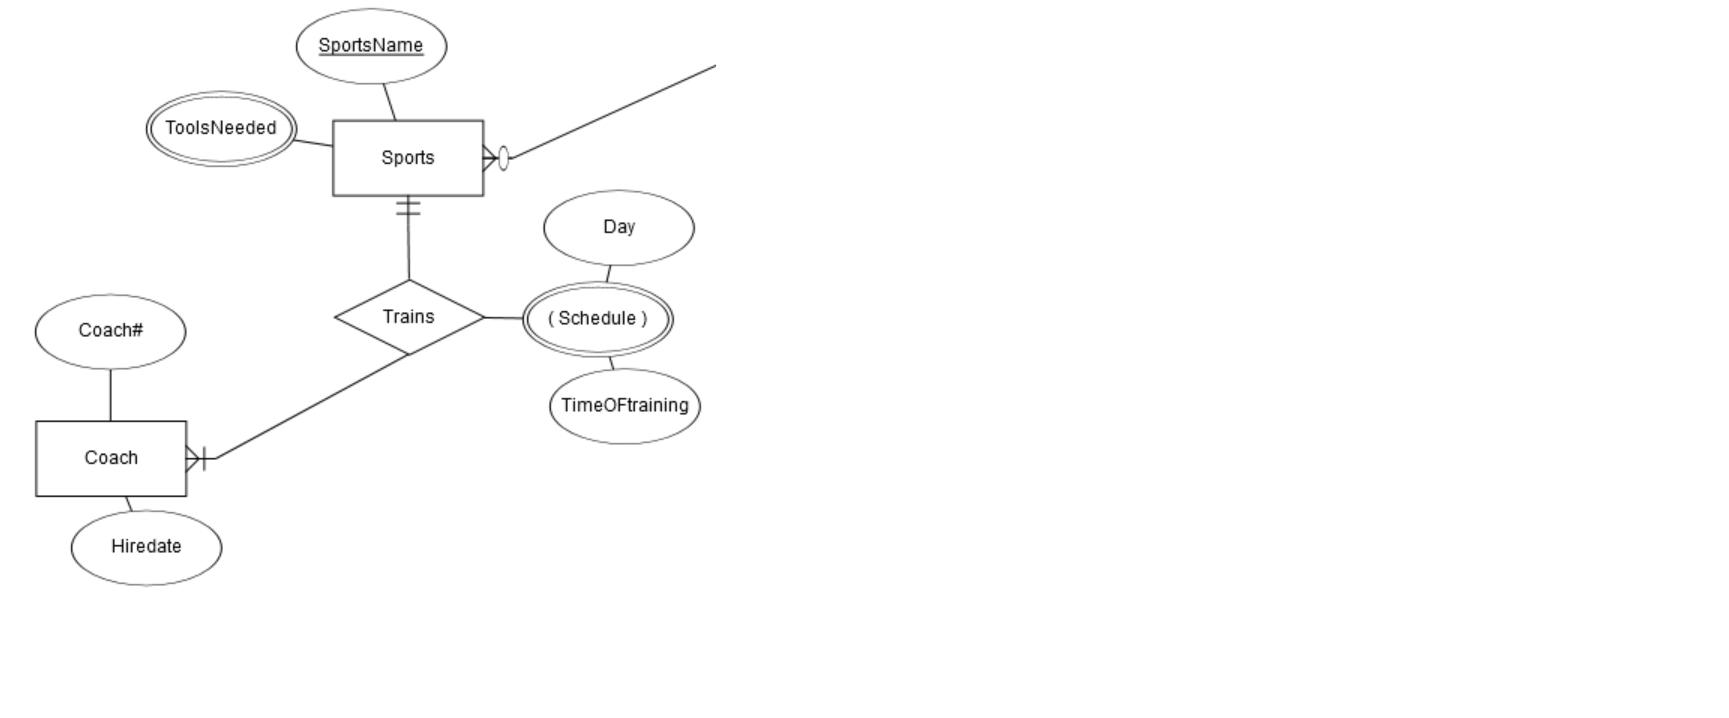 How To Convert This Er Diagram To Relational Schema - Stack regarding Er Diagram To Schema